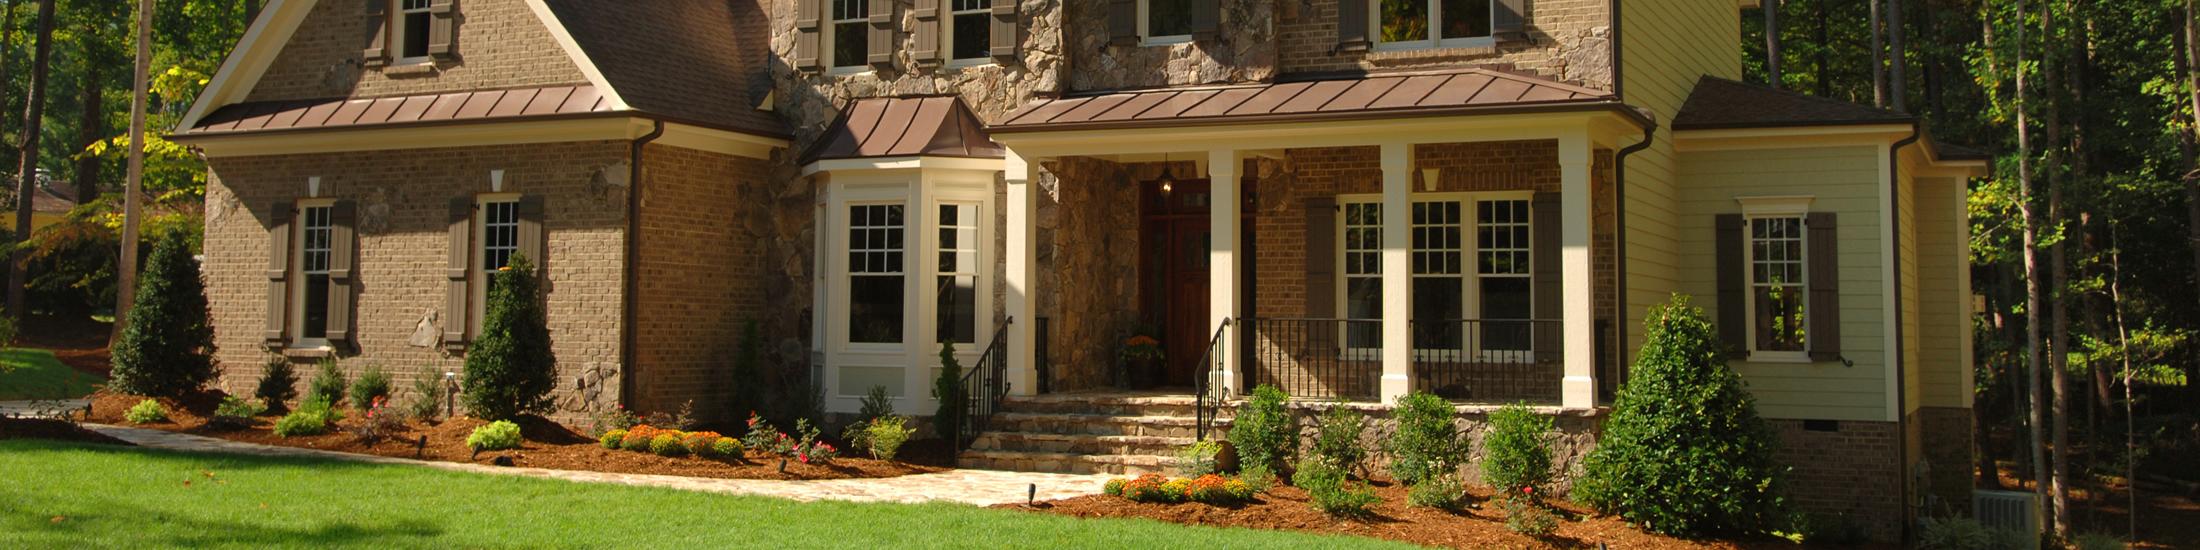 Green Oak Township real estate